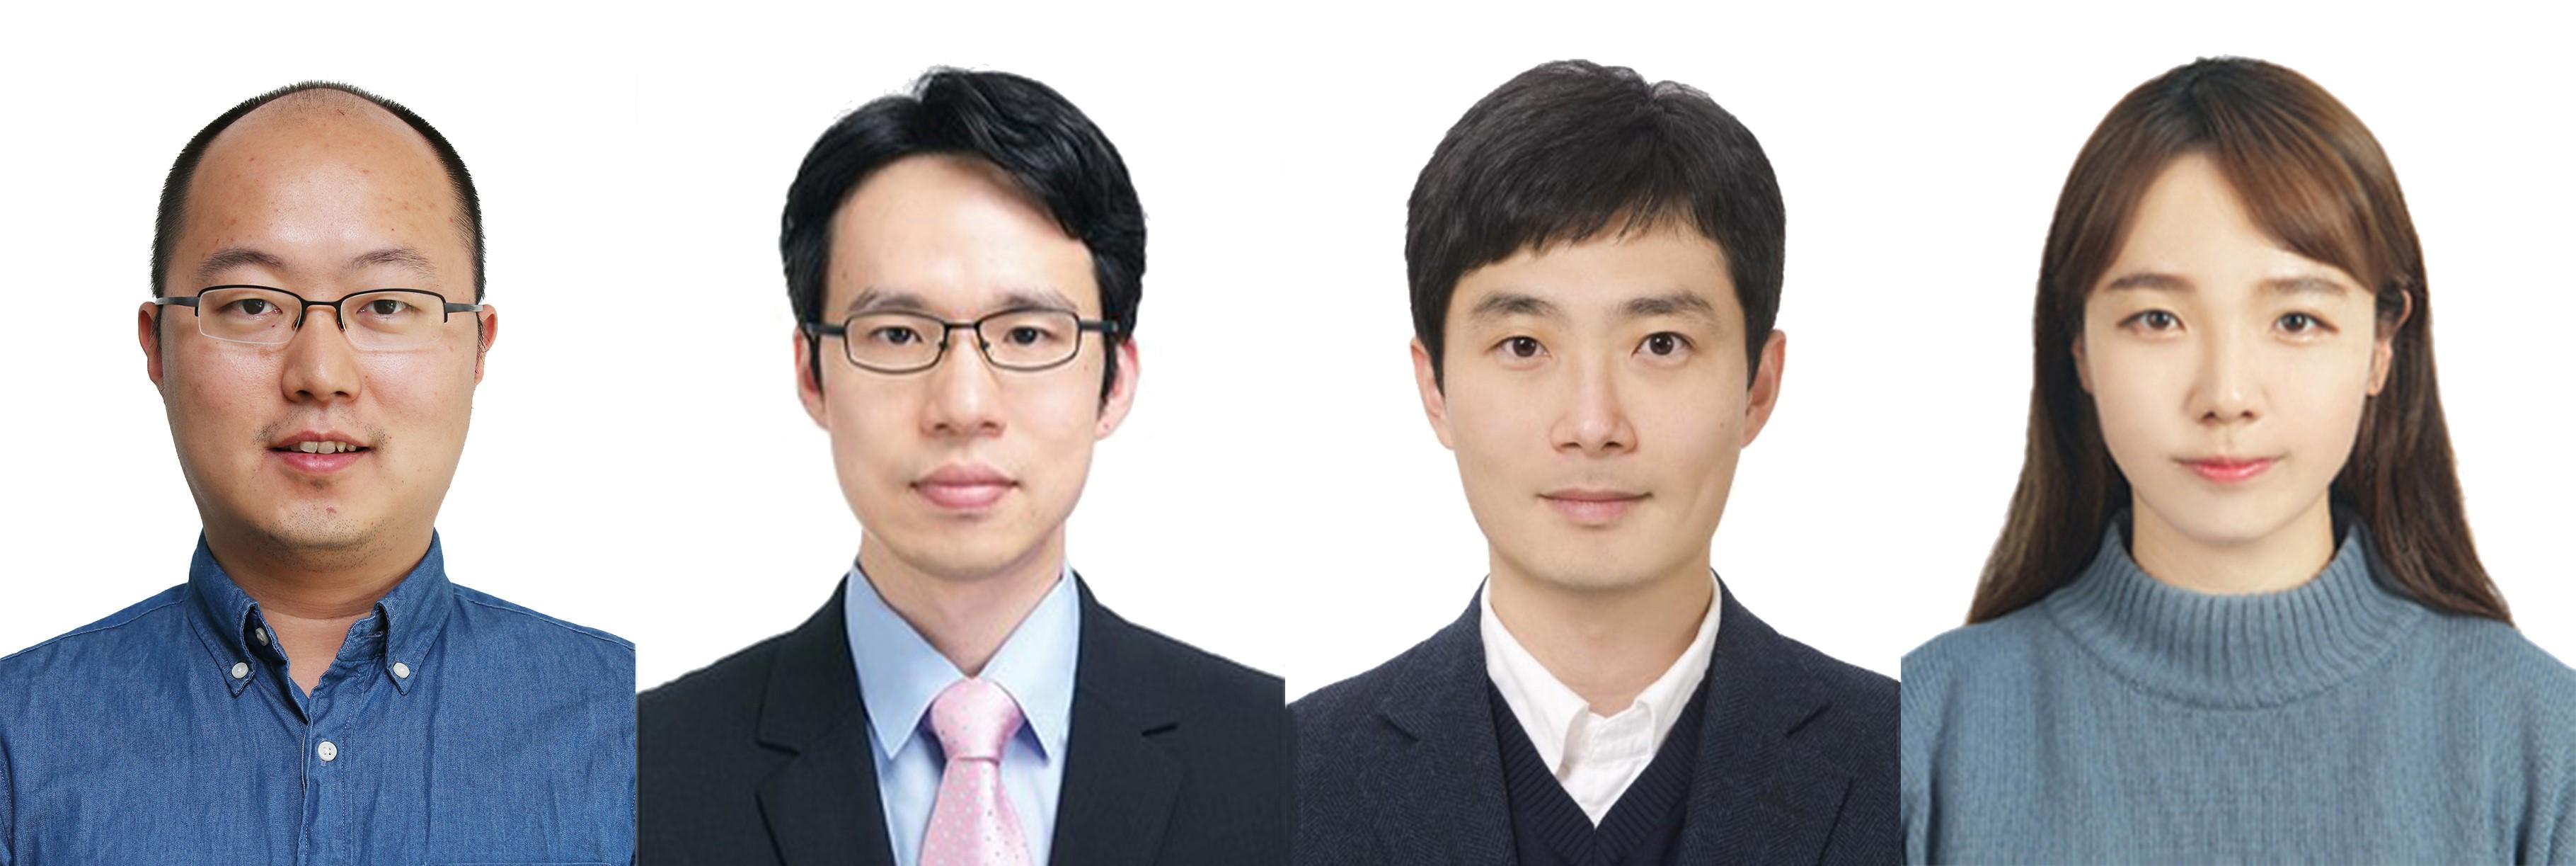 _images_000005_YongKeun_Park,_Jonghwa_Shin,_Hongki_Yoo,_Sejeong_Kim.jpg